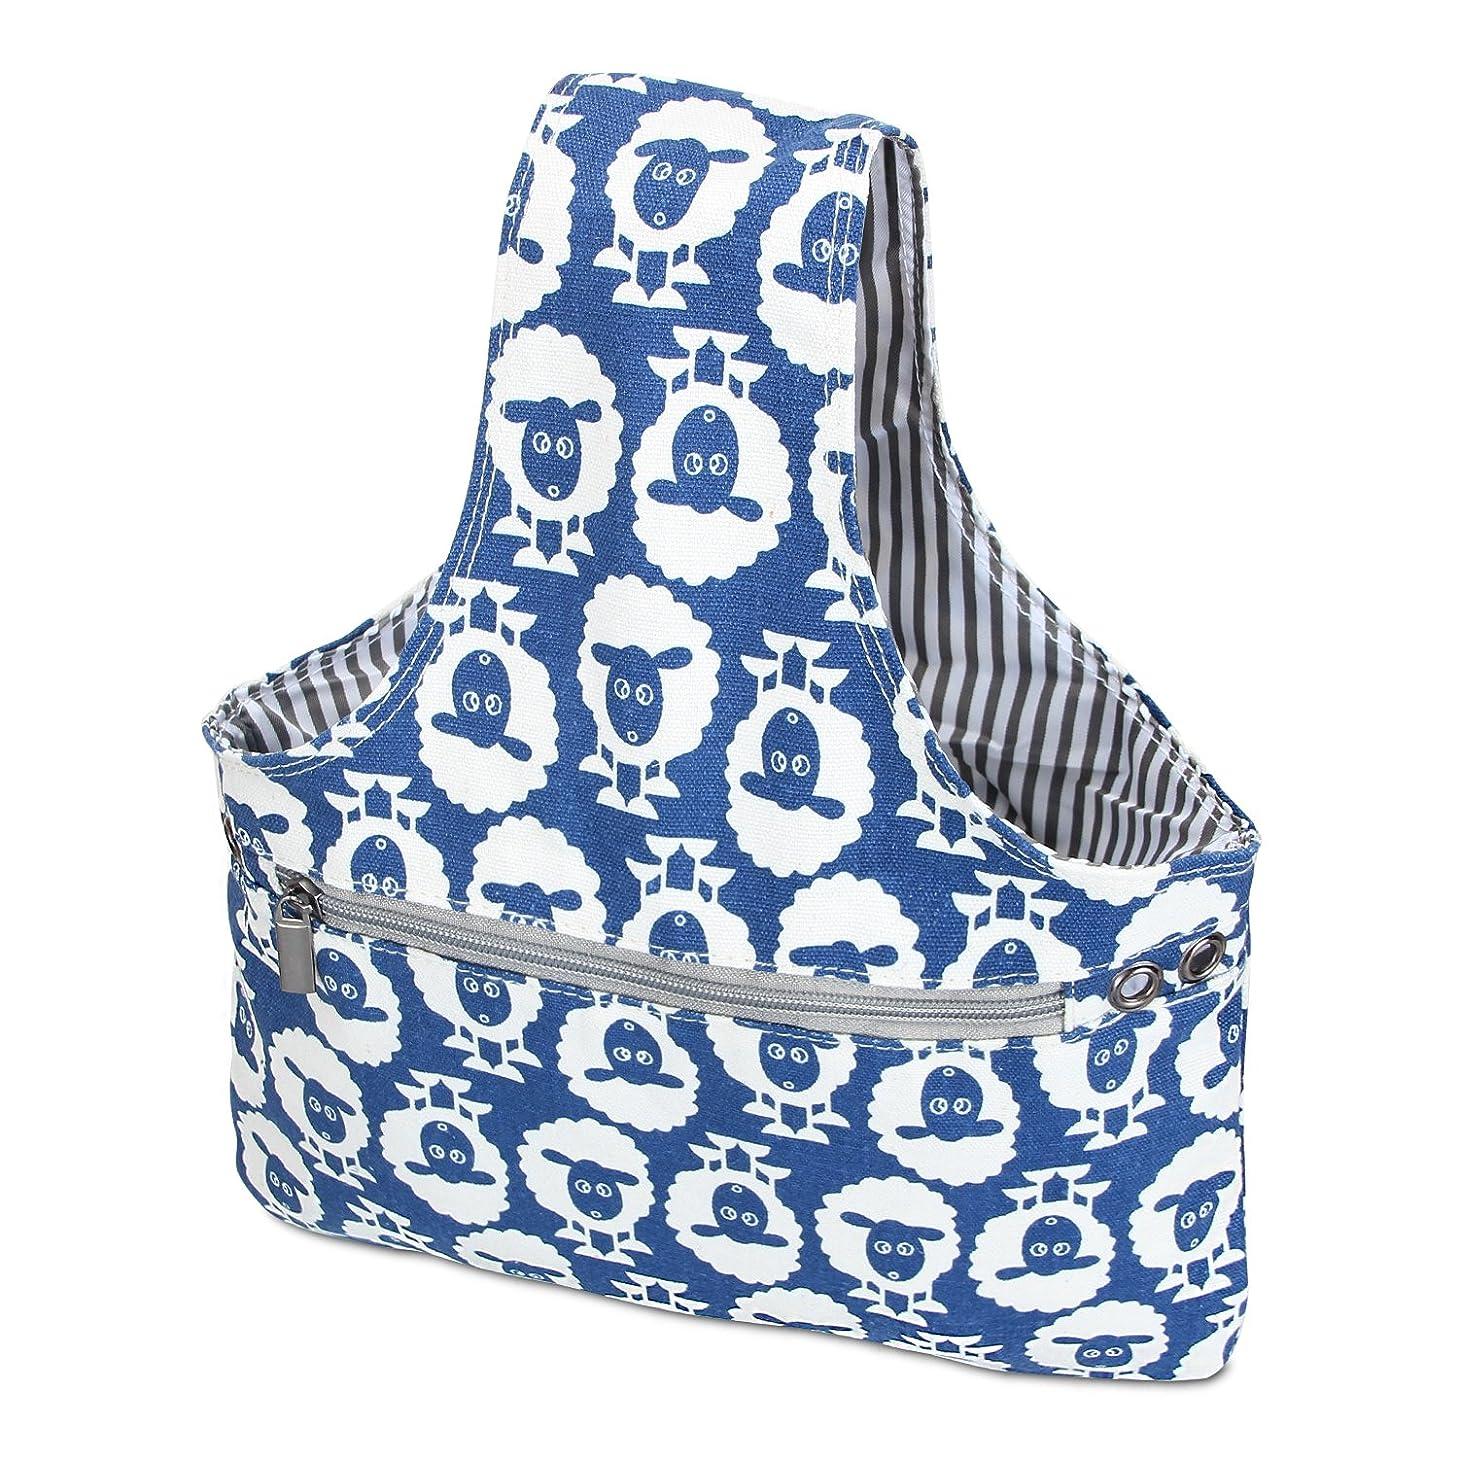 Teamoy Knitting Tote Bag(L12.2